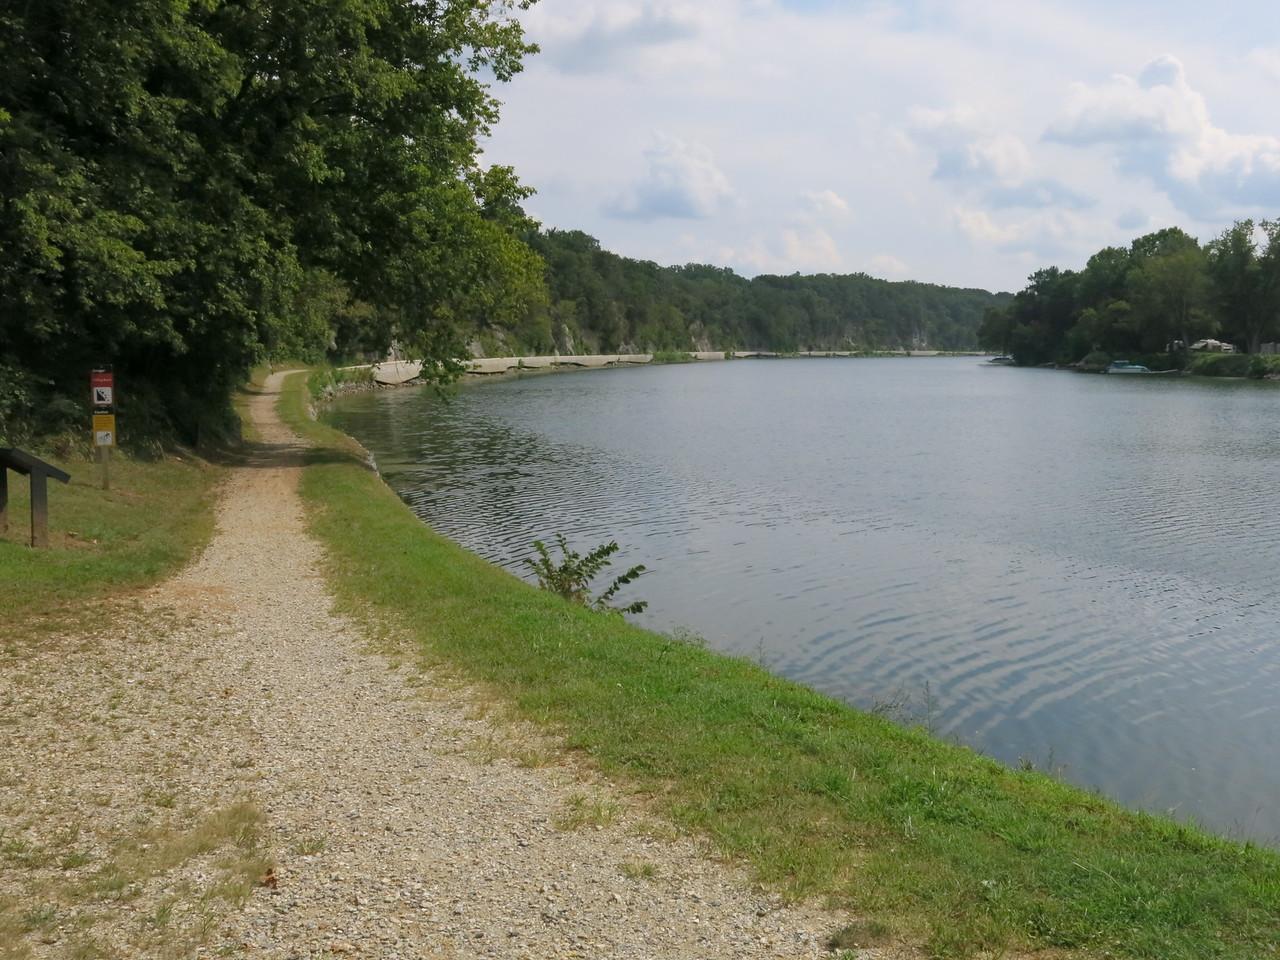 Towpath along the Potomac at Big Slackwater in downstream view